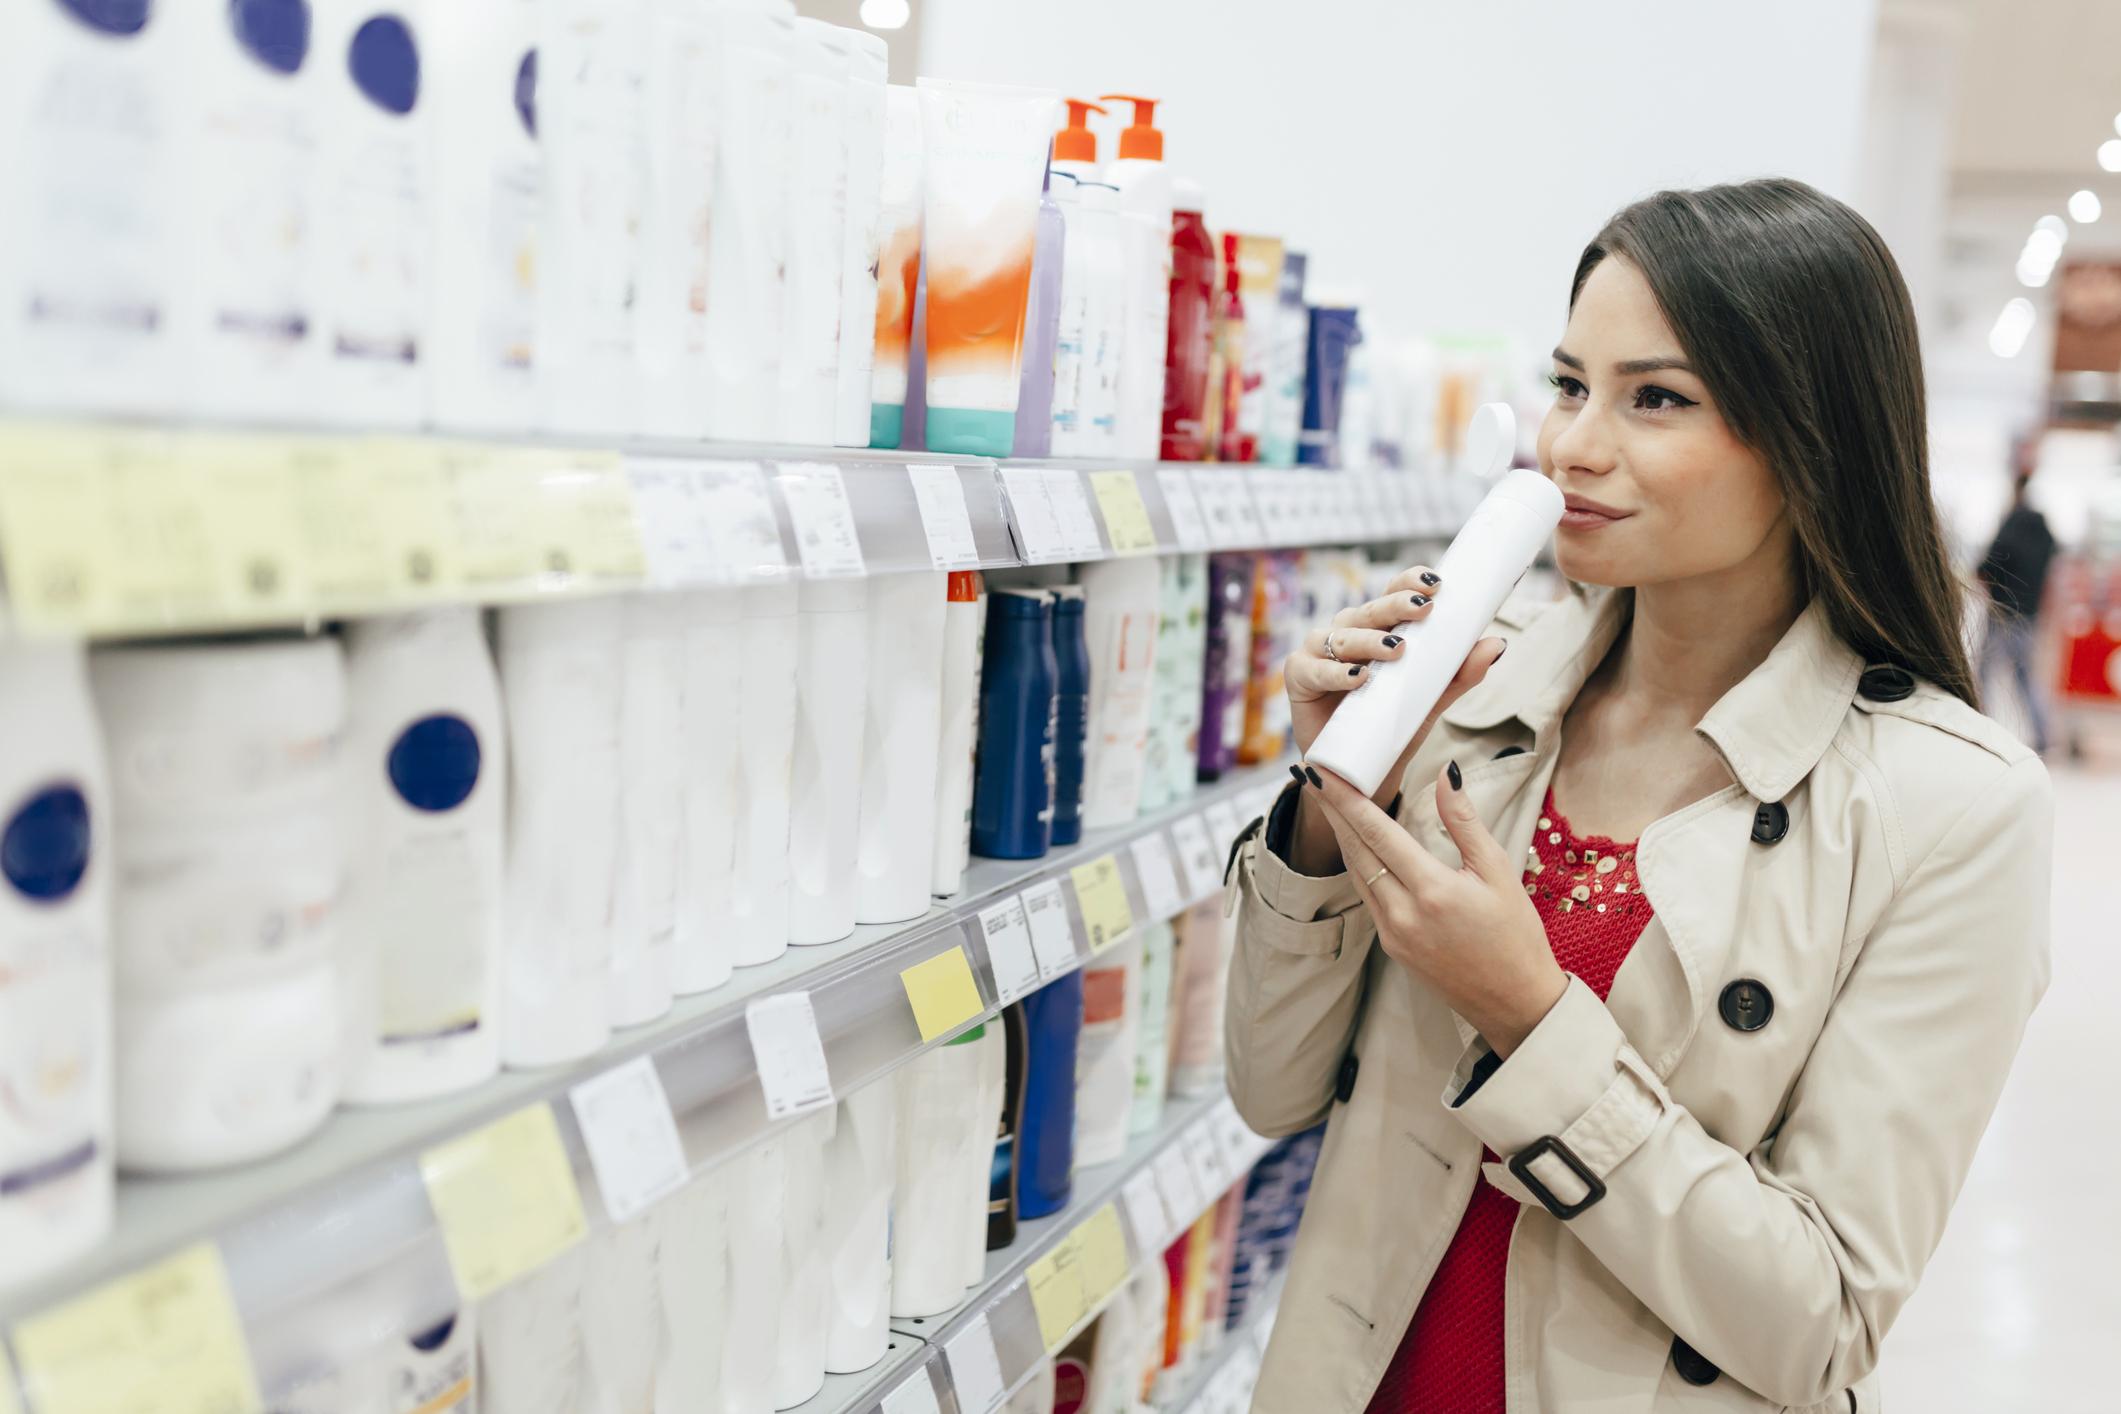 A woman shops in the shampoo aisle.